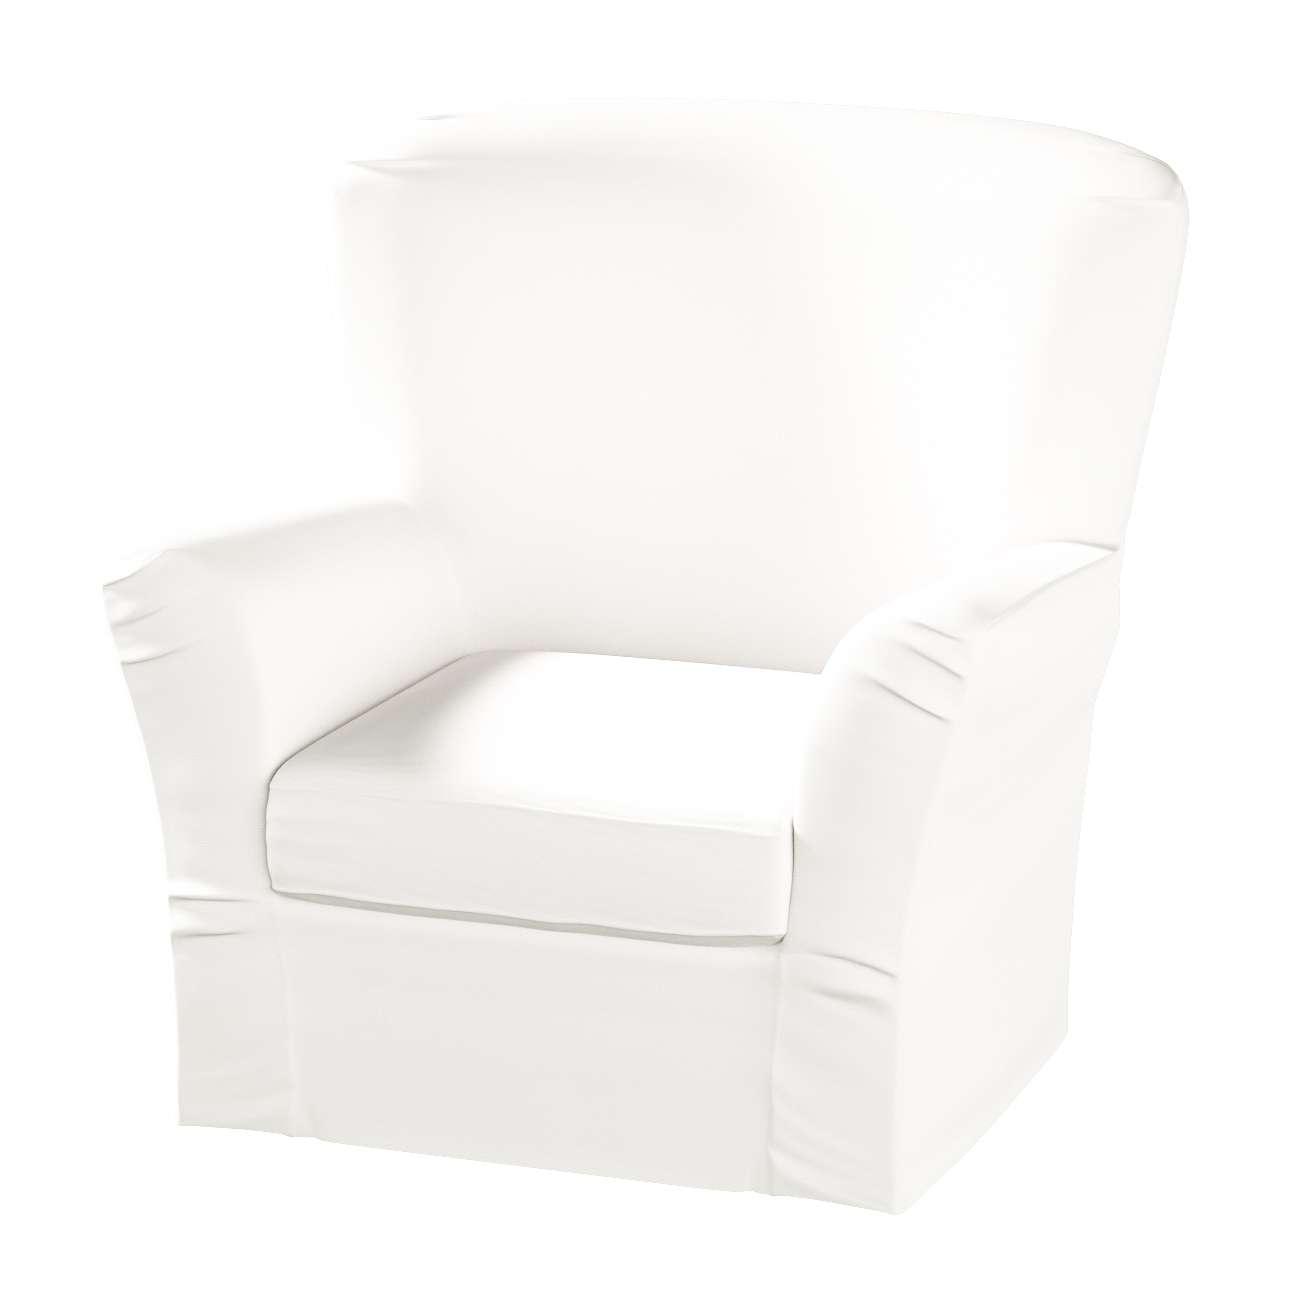 TOMELILLA fotelio užvalkalas TOMELILLA fotelis kolekcijoje Cotton Panama, audinys: 702-34